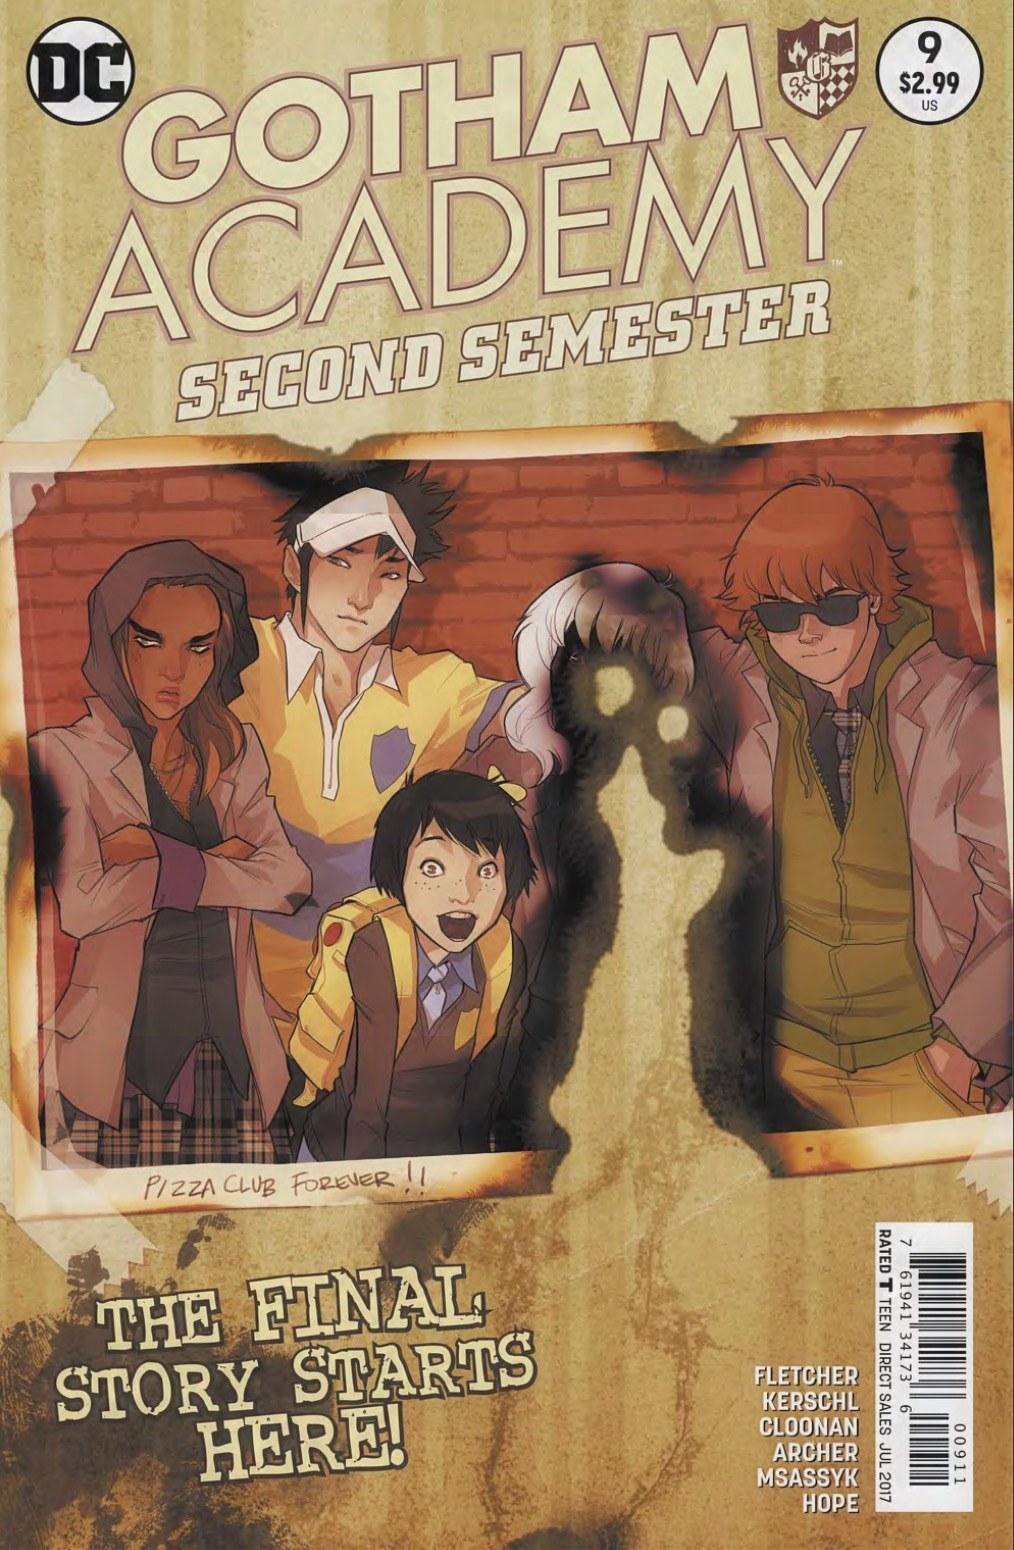 Gotham Academy Second Semester #9 Review